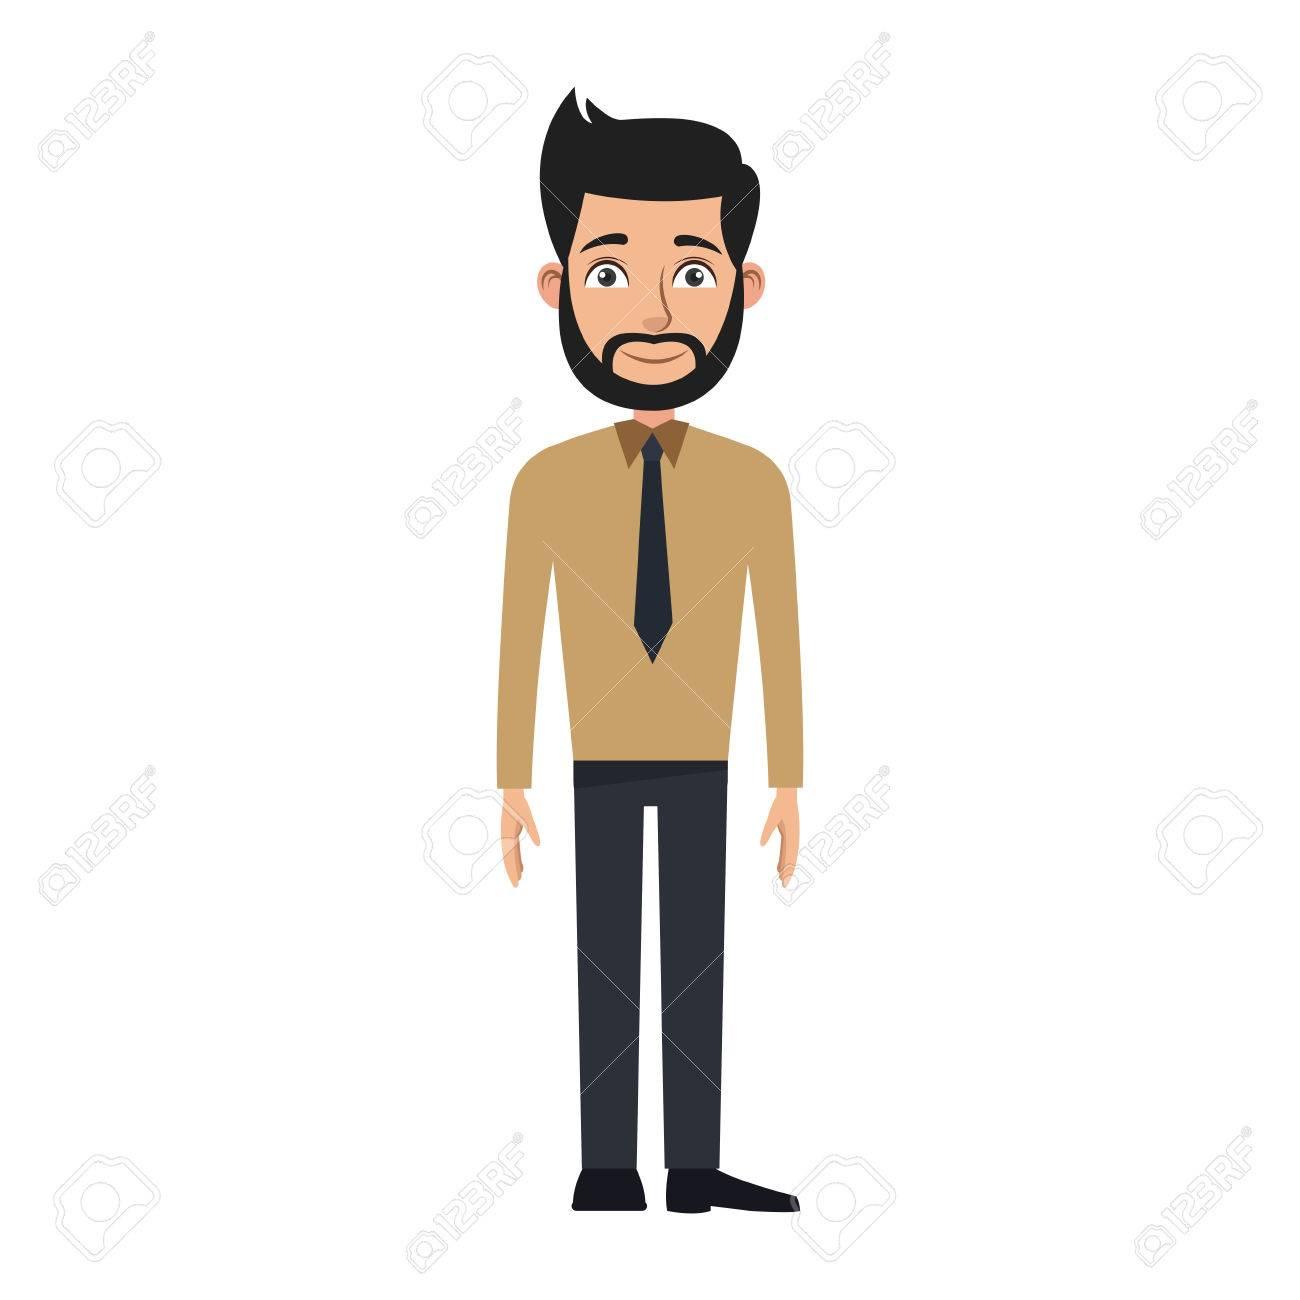 business man cartoon character young male professional vector rh 123rf com business man cartoon picture businessman cartoon character free download